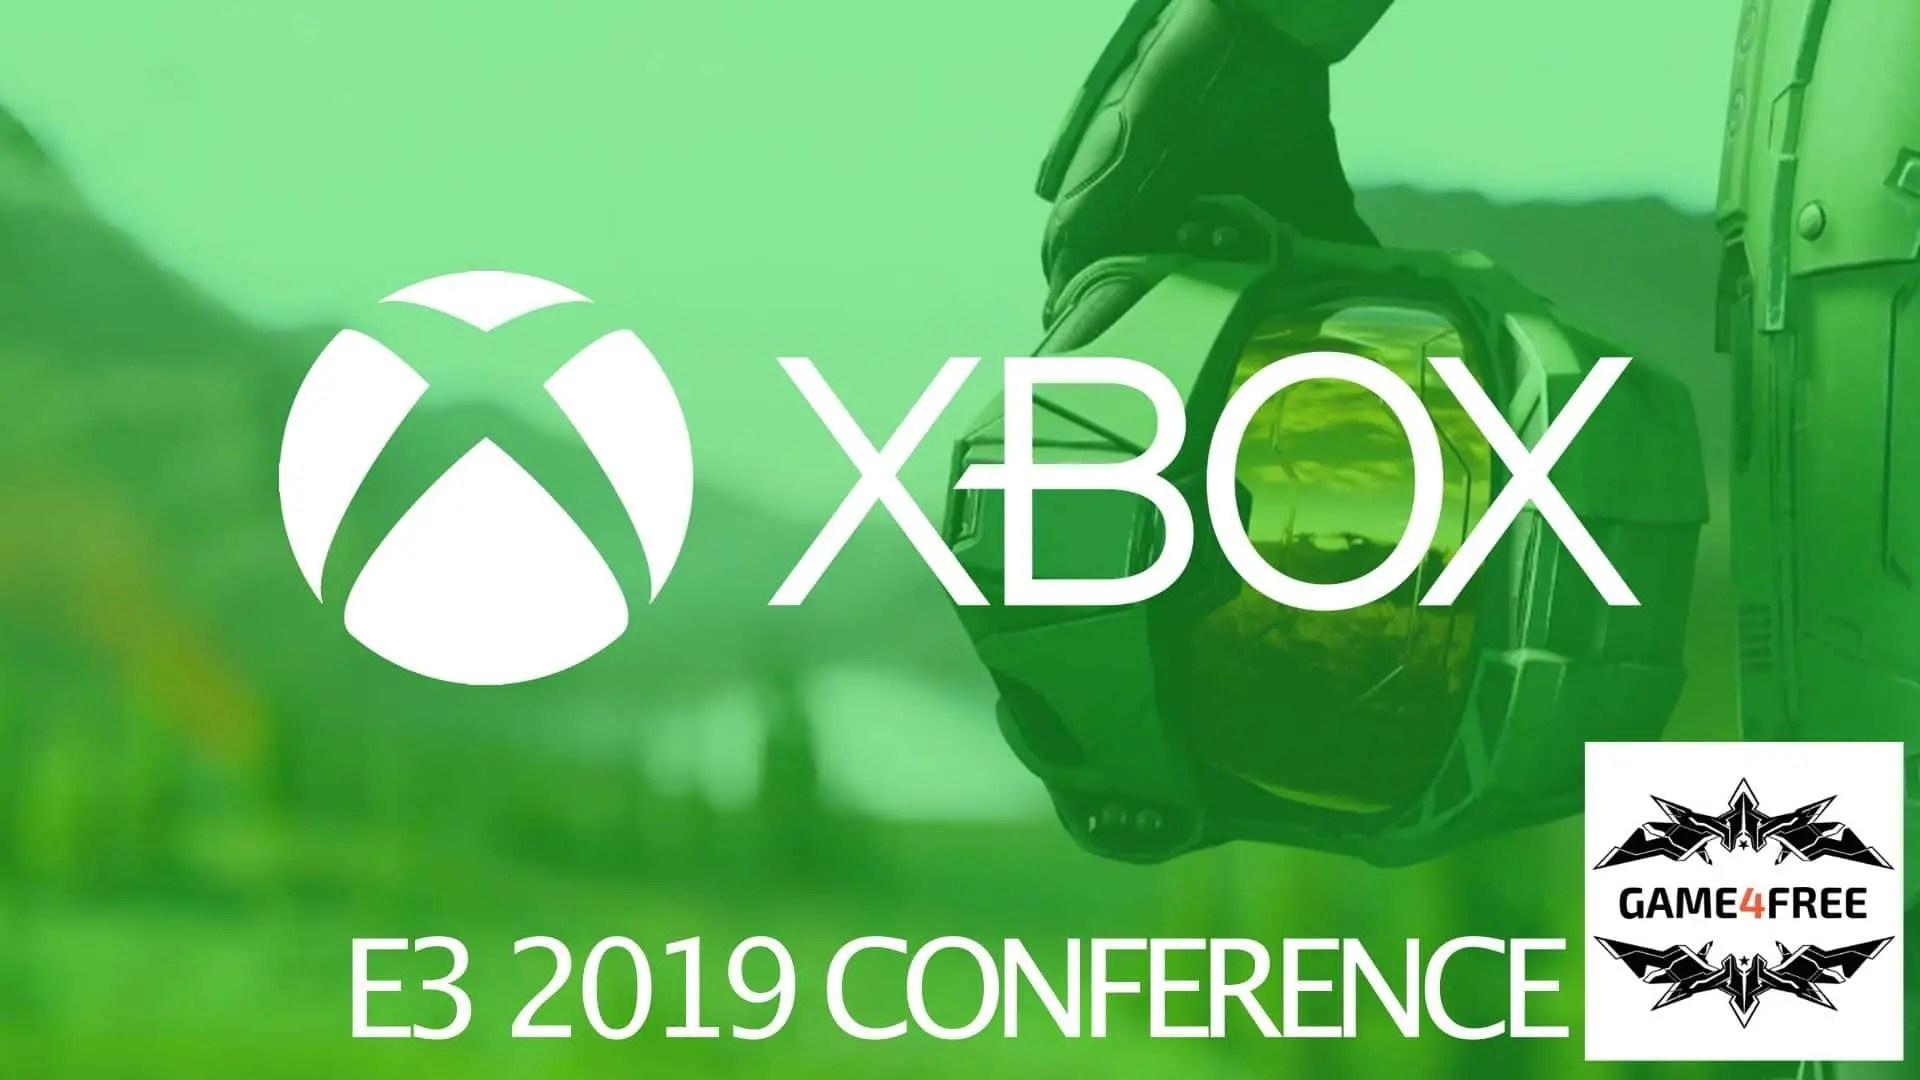 E3 2019 : Quand a lieu la conférence XBOX de l'E3 2019 ?